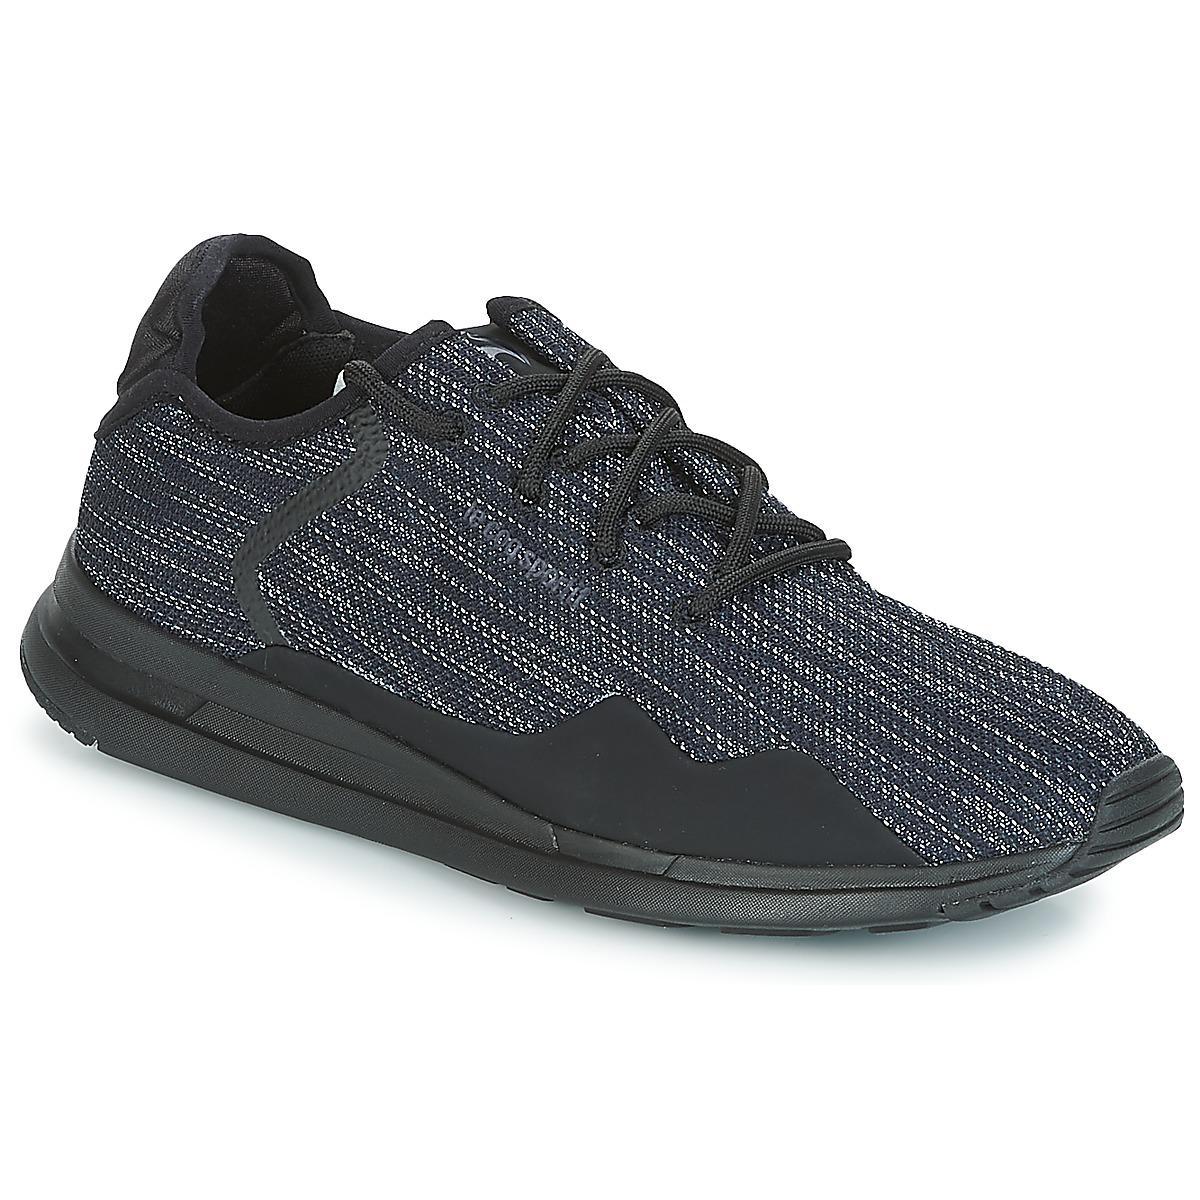 6366bf5bc2b9 Le Coq Sportif Solas Premium Men s Shoes (trainers) In Black in ...